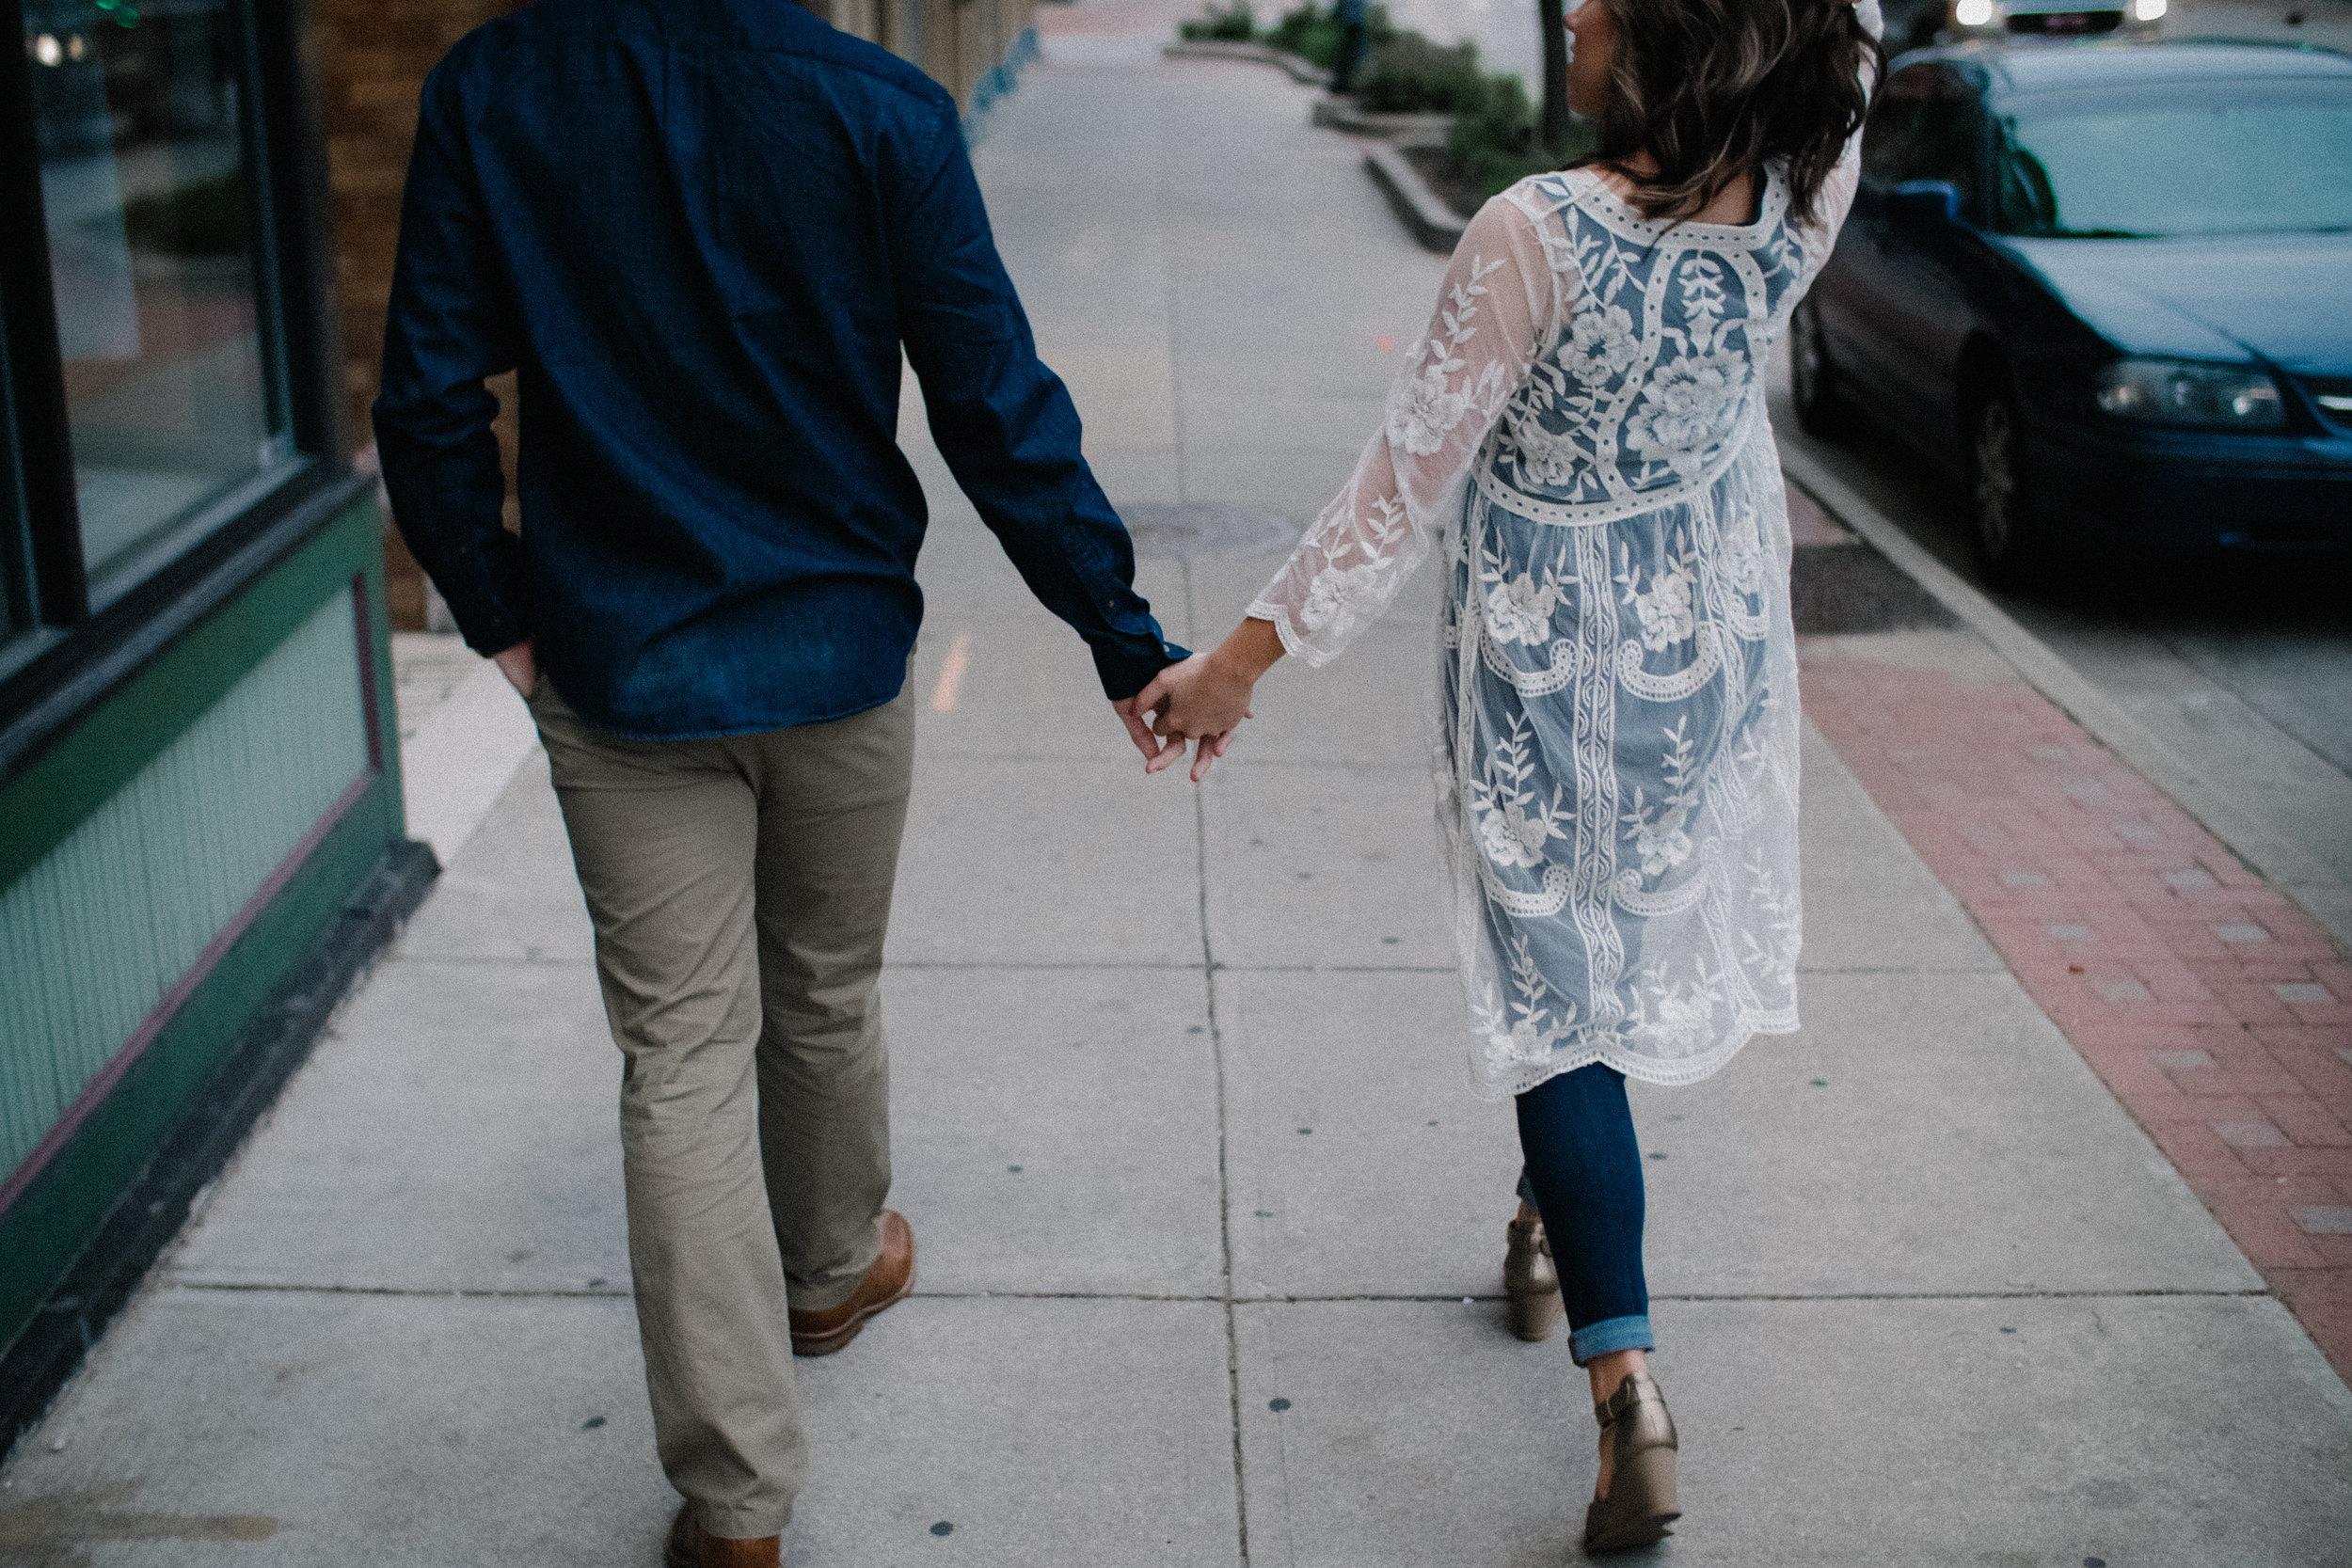 Lauren_Nick_Manzer_Bailey_Engagement_Photos_0185.jpg